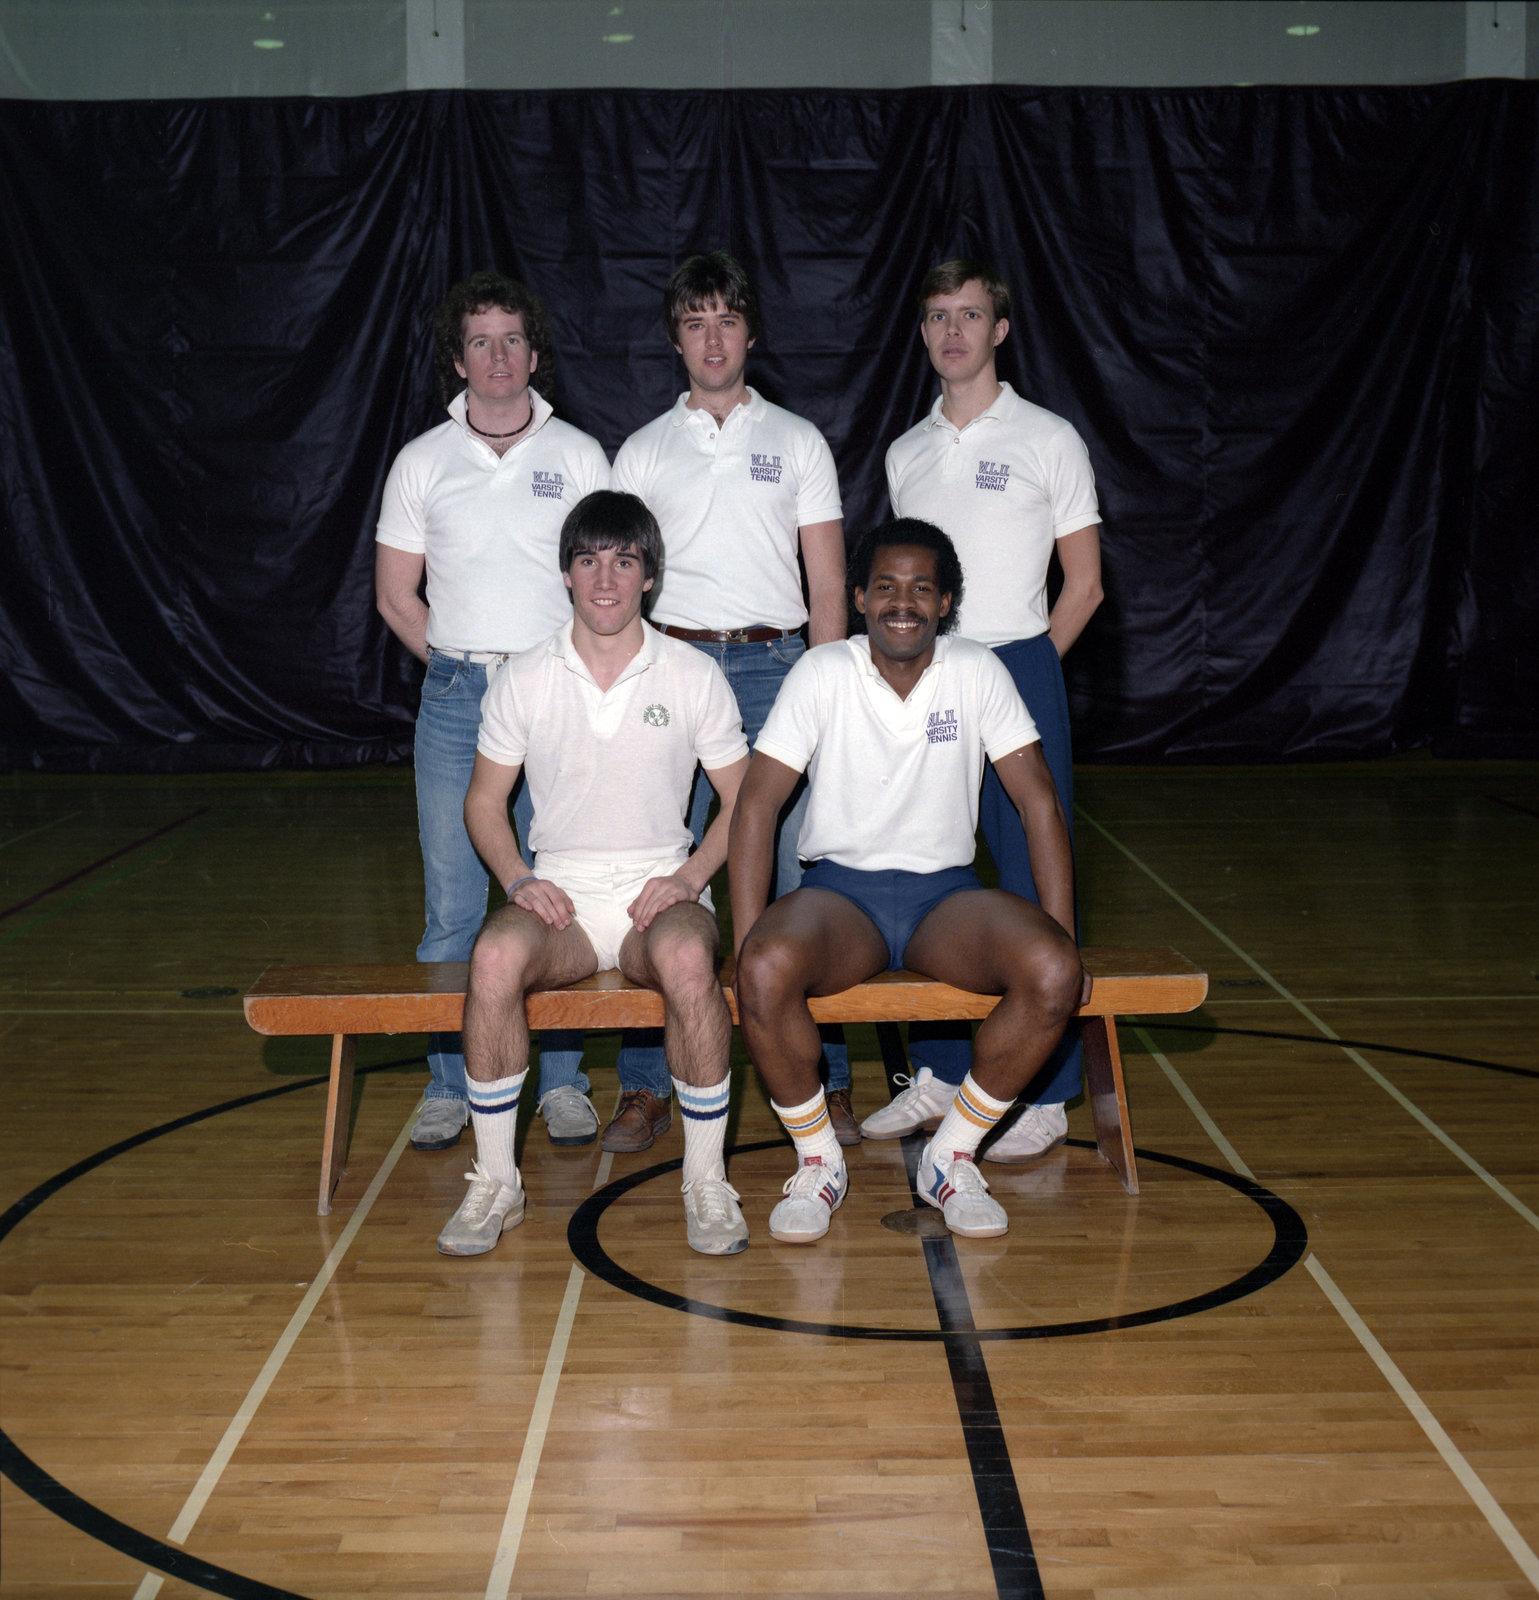 Wilfrid Laurier University men's tennis team, 1985